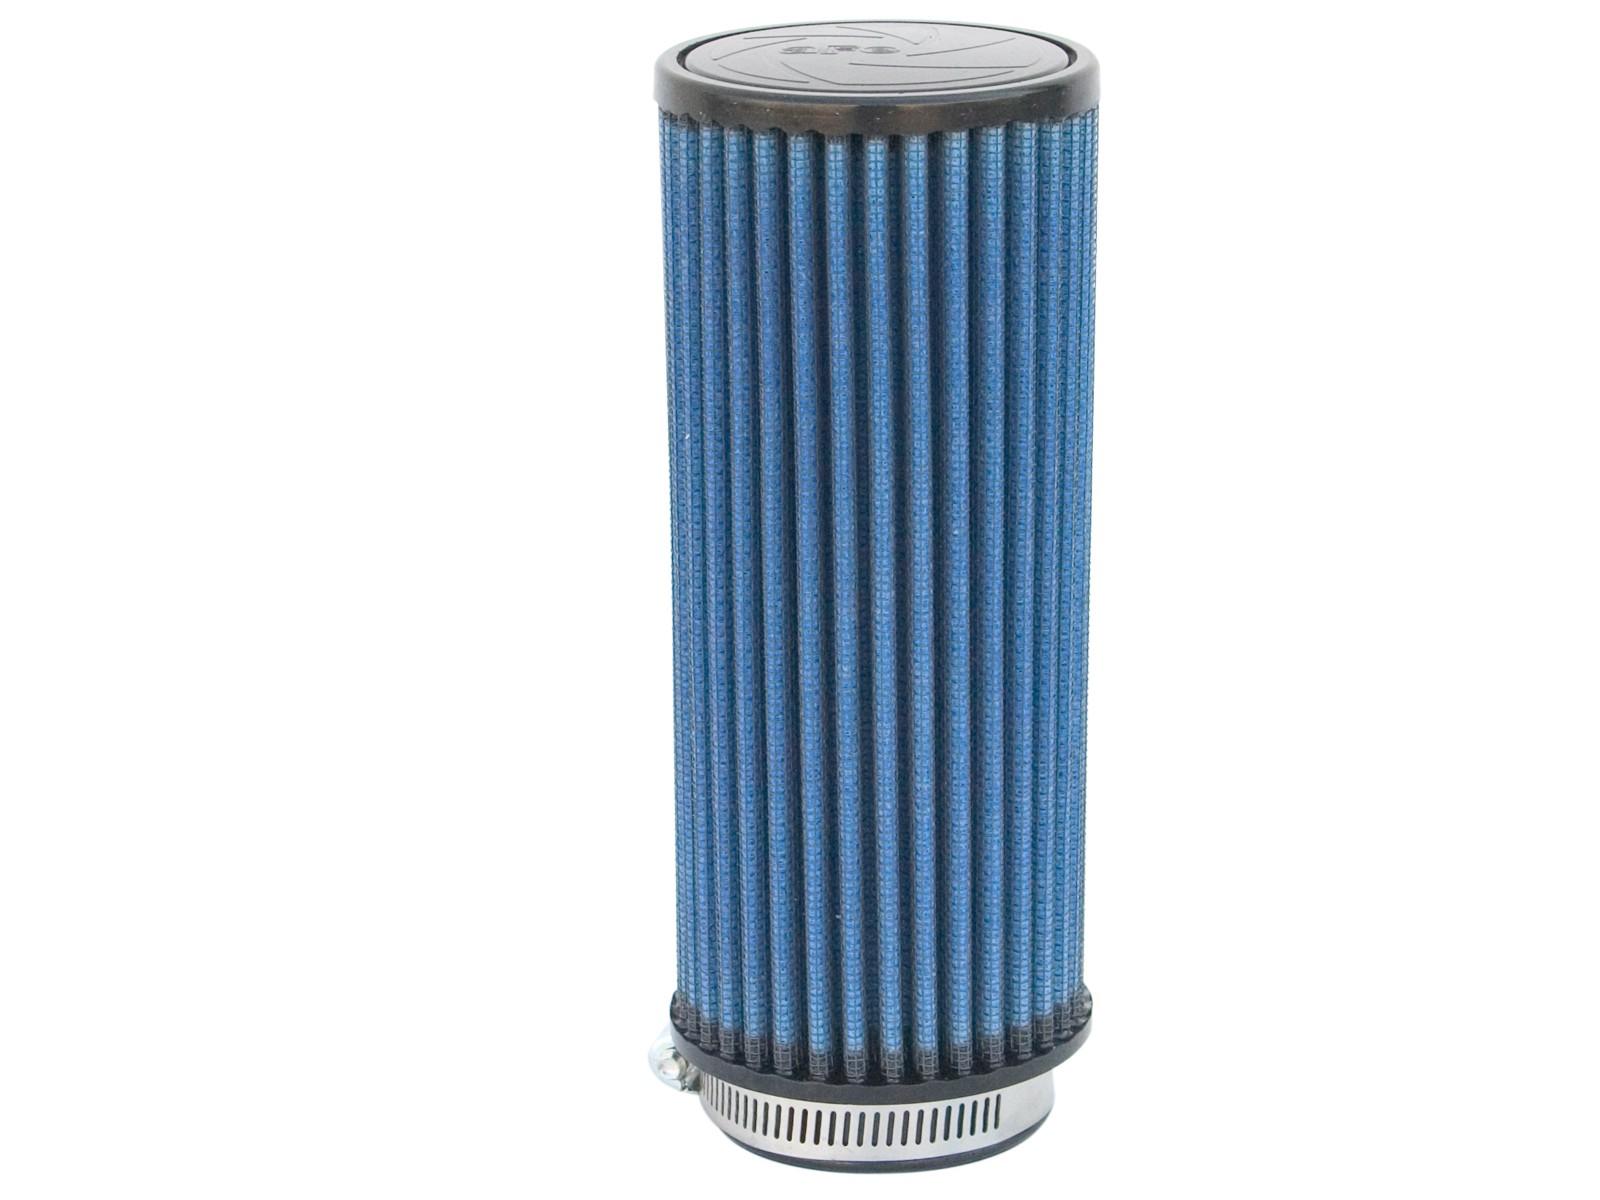 aFe POWER 24-20507 Magnum FLOW Pro 5R Air Filter